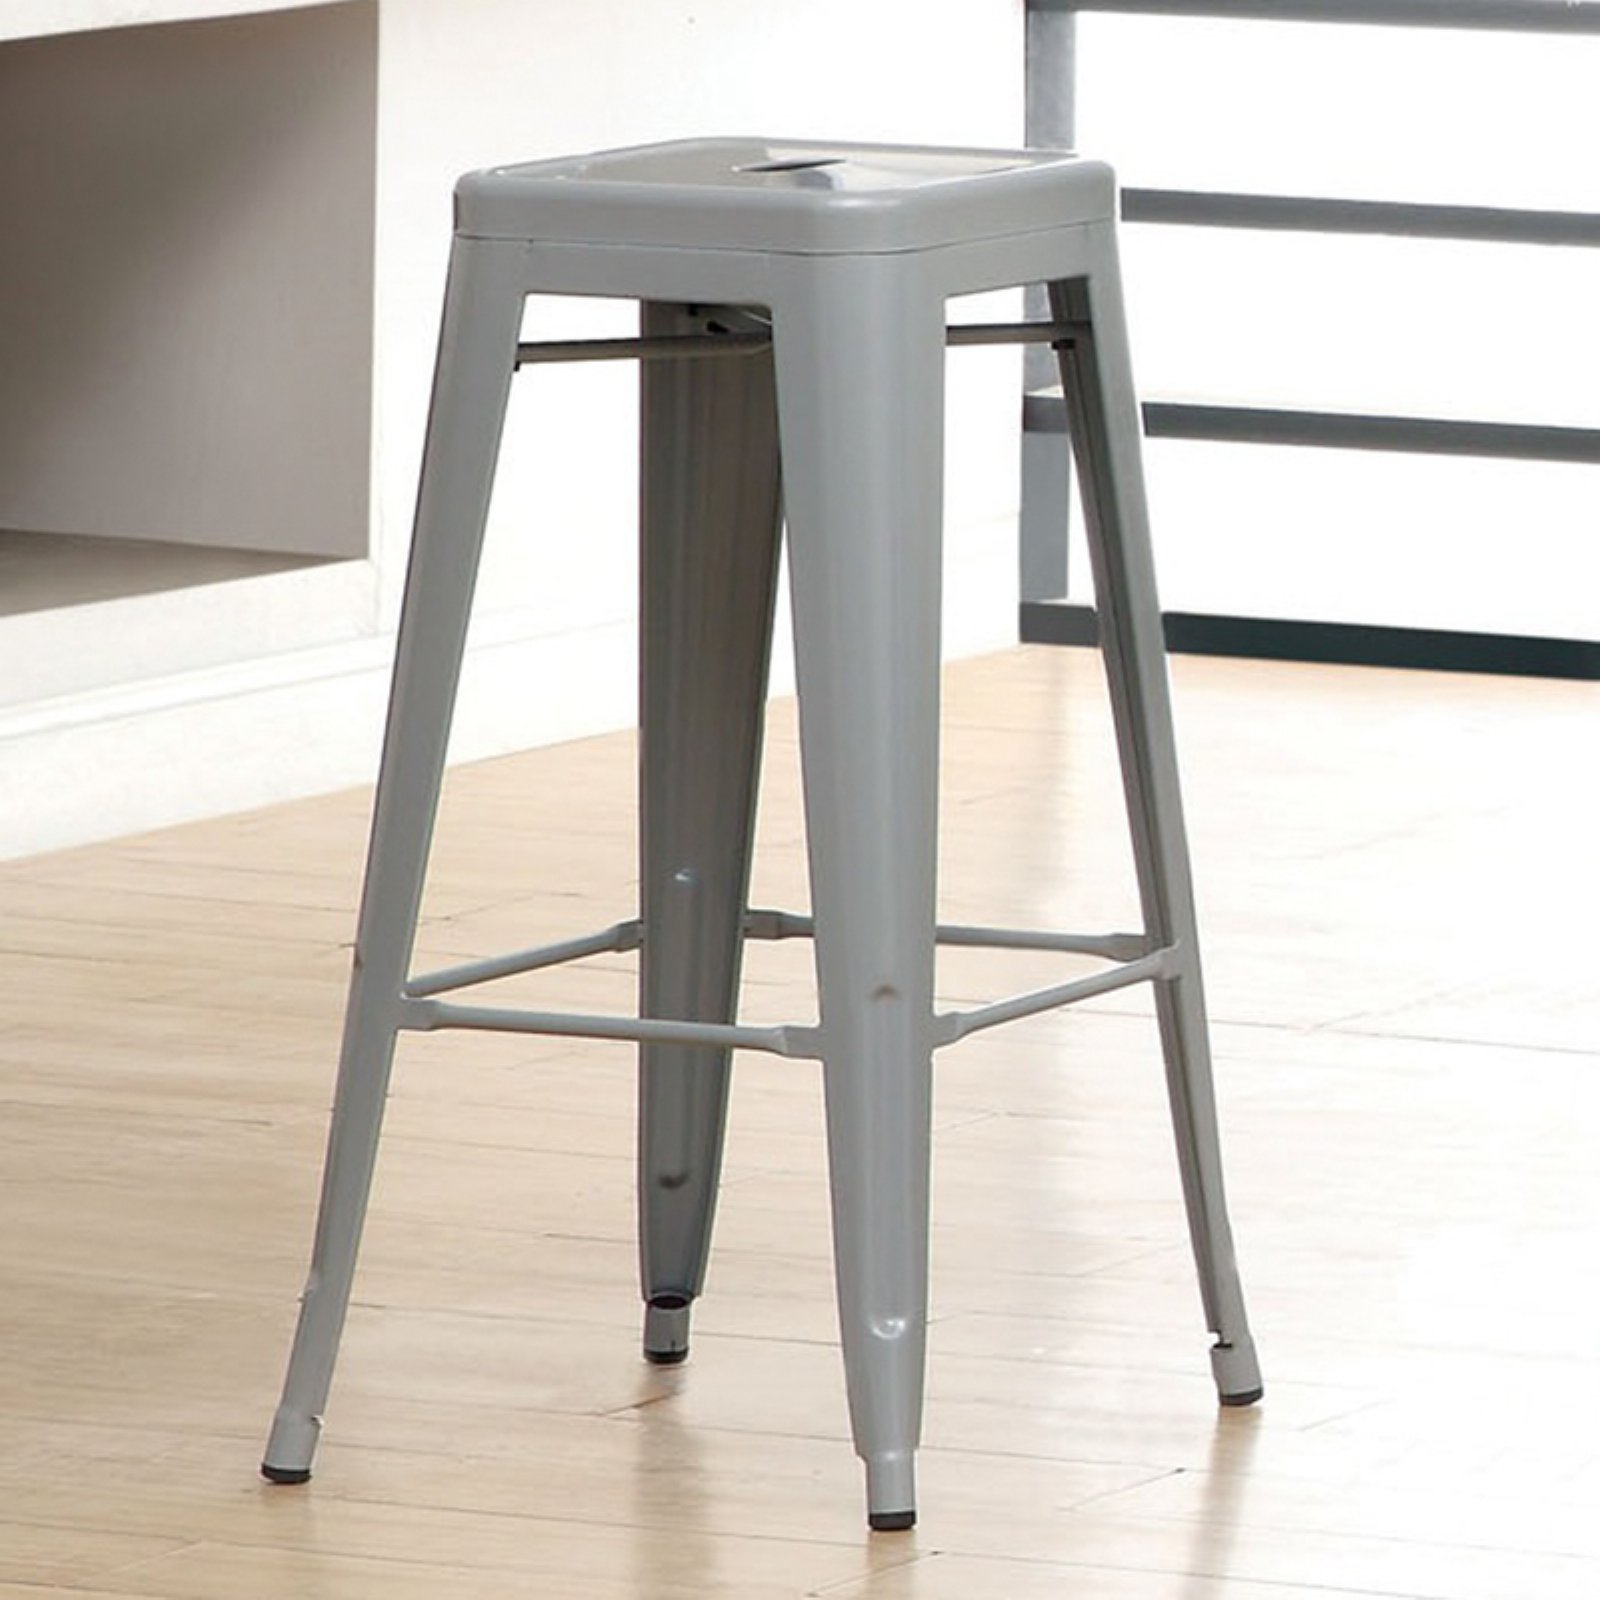 Furniture of America Stilletta Steel Stool